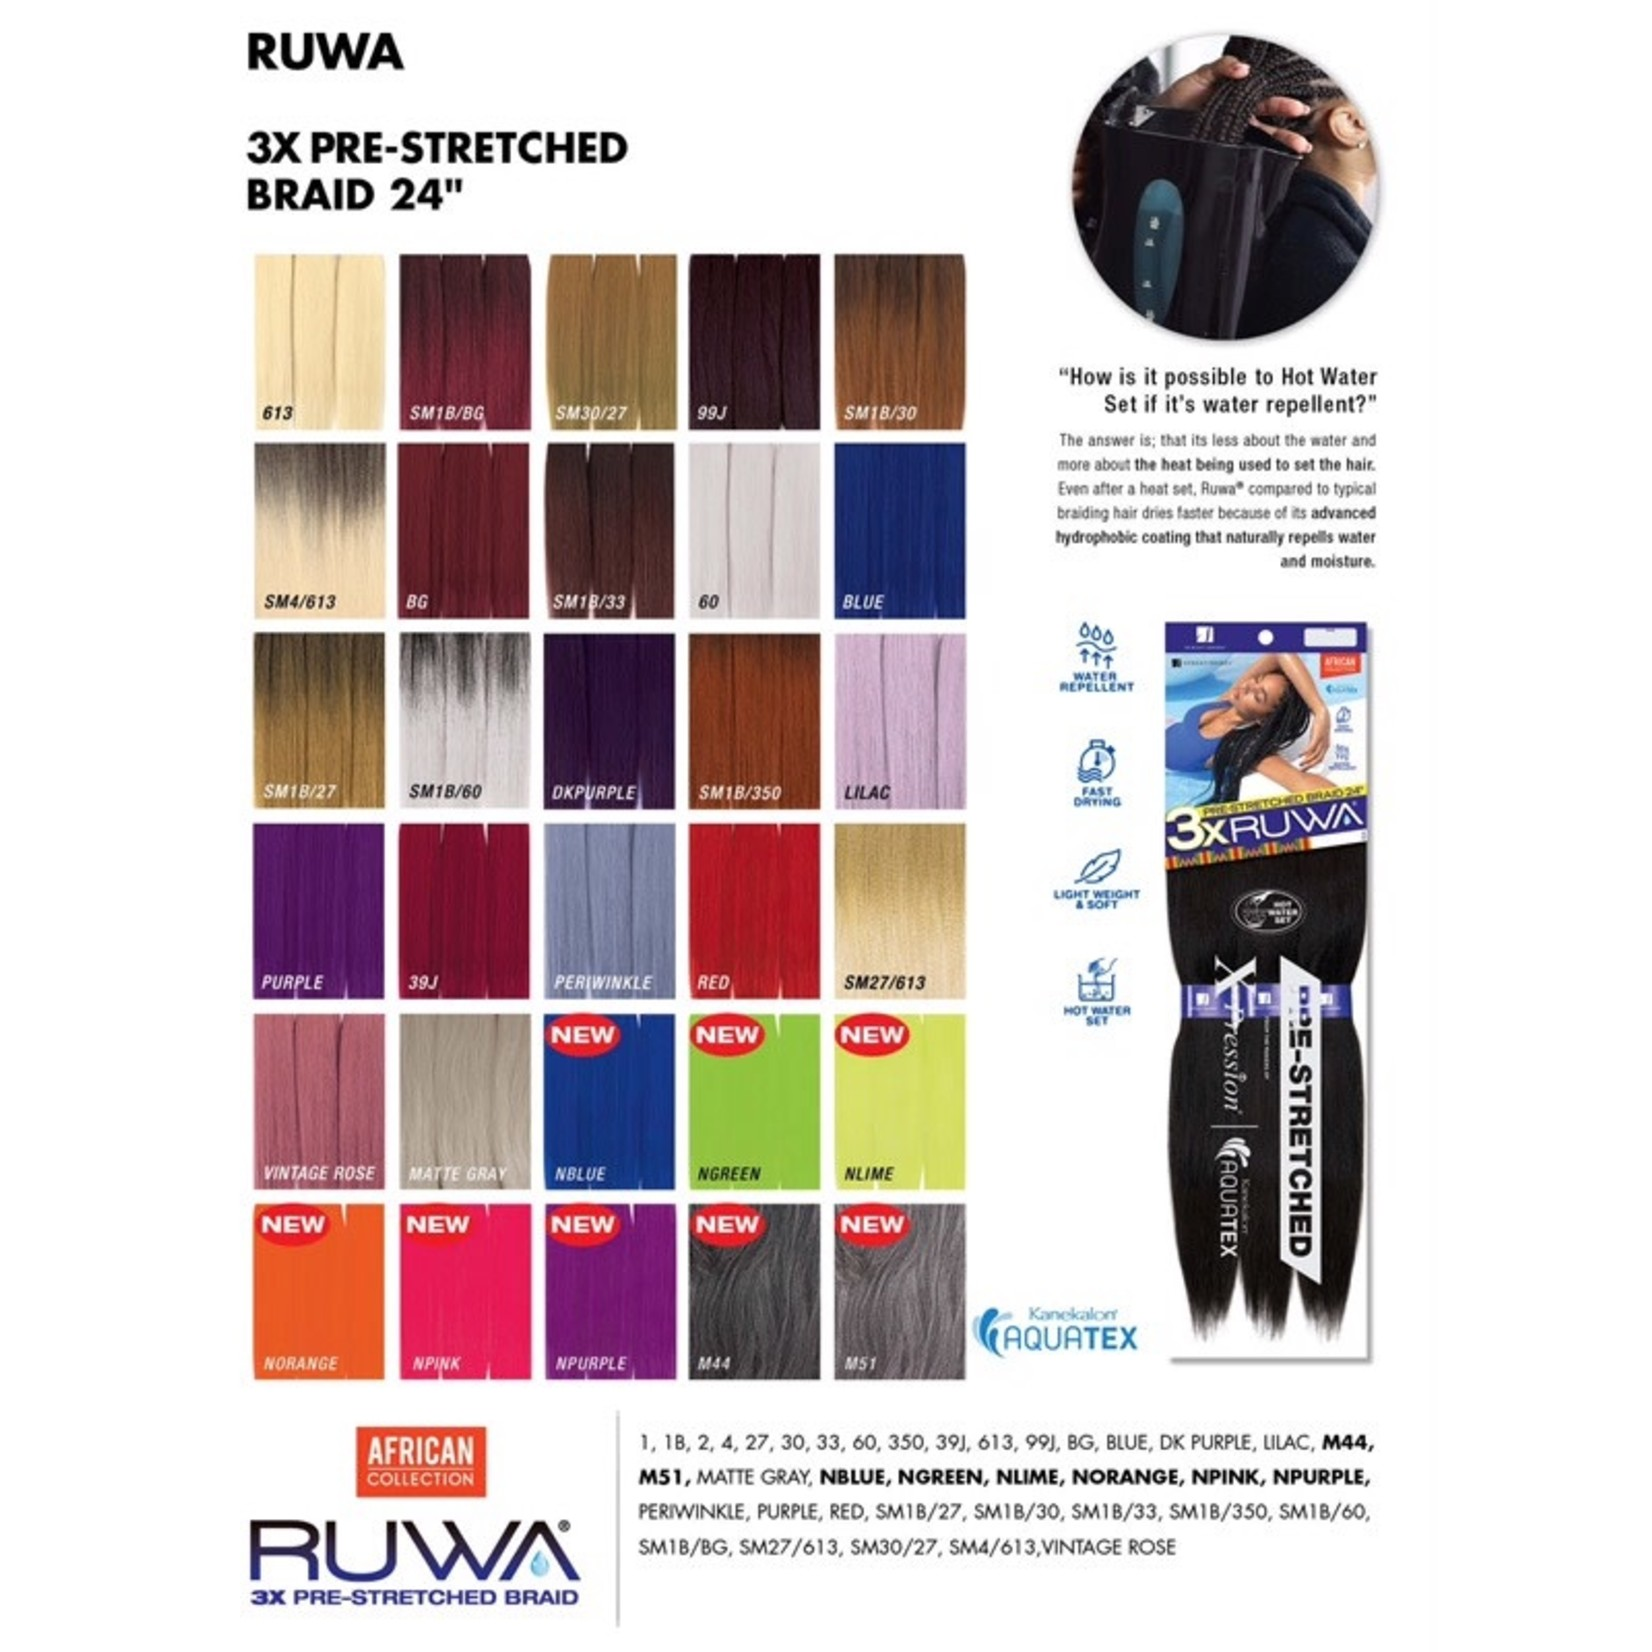 "Ruwa 3X Pre-Stretched Braid 24"""